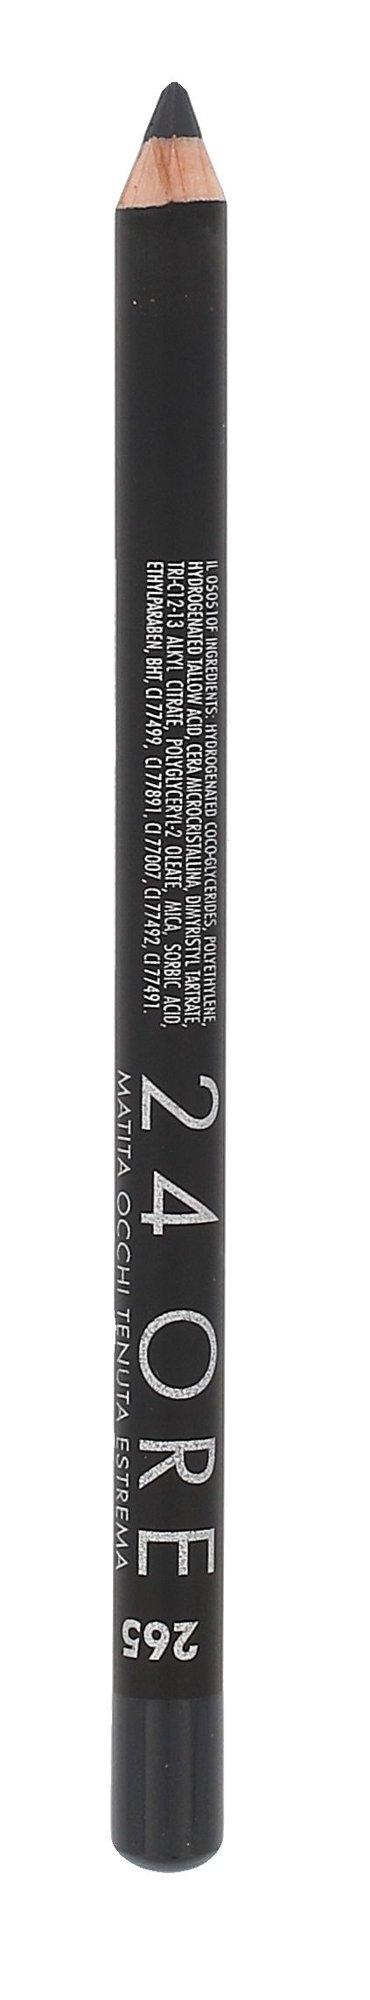 Deborah Milano 24Ore Cosmetic 1,2ml 265